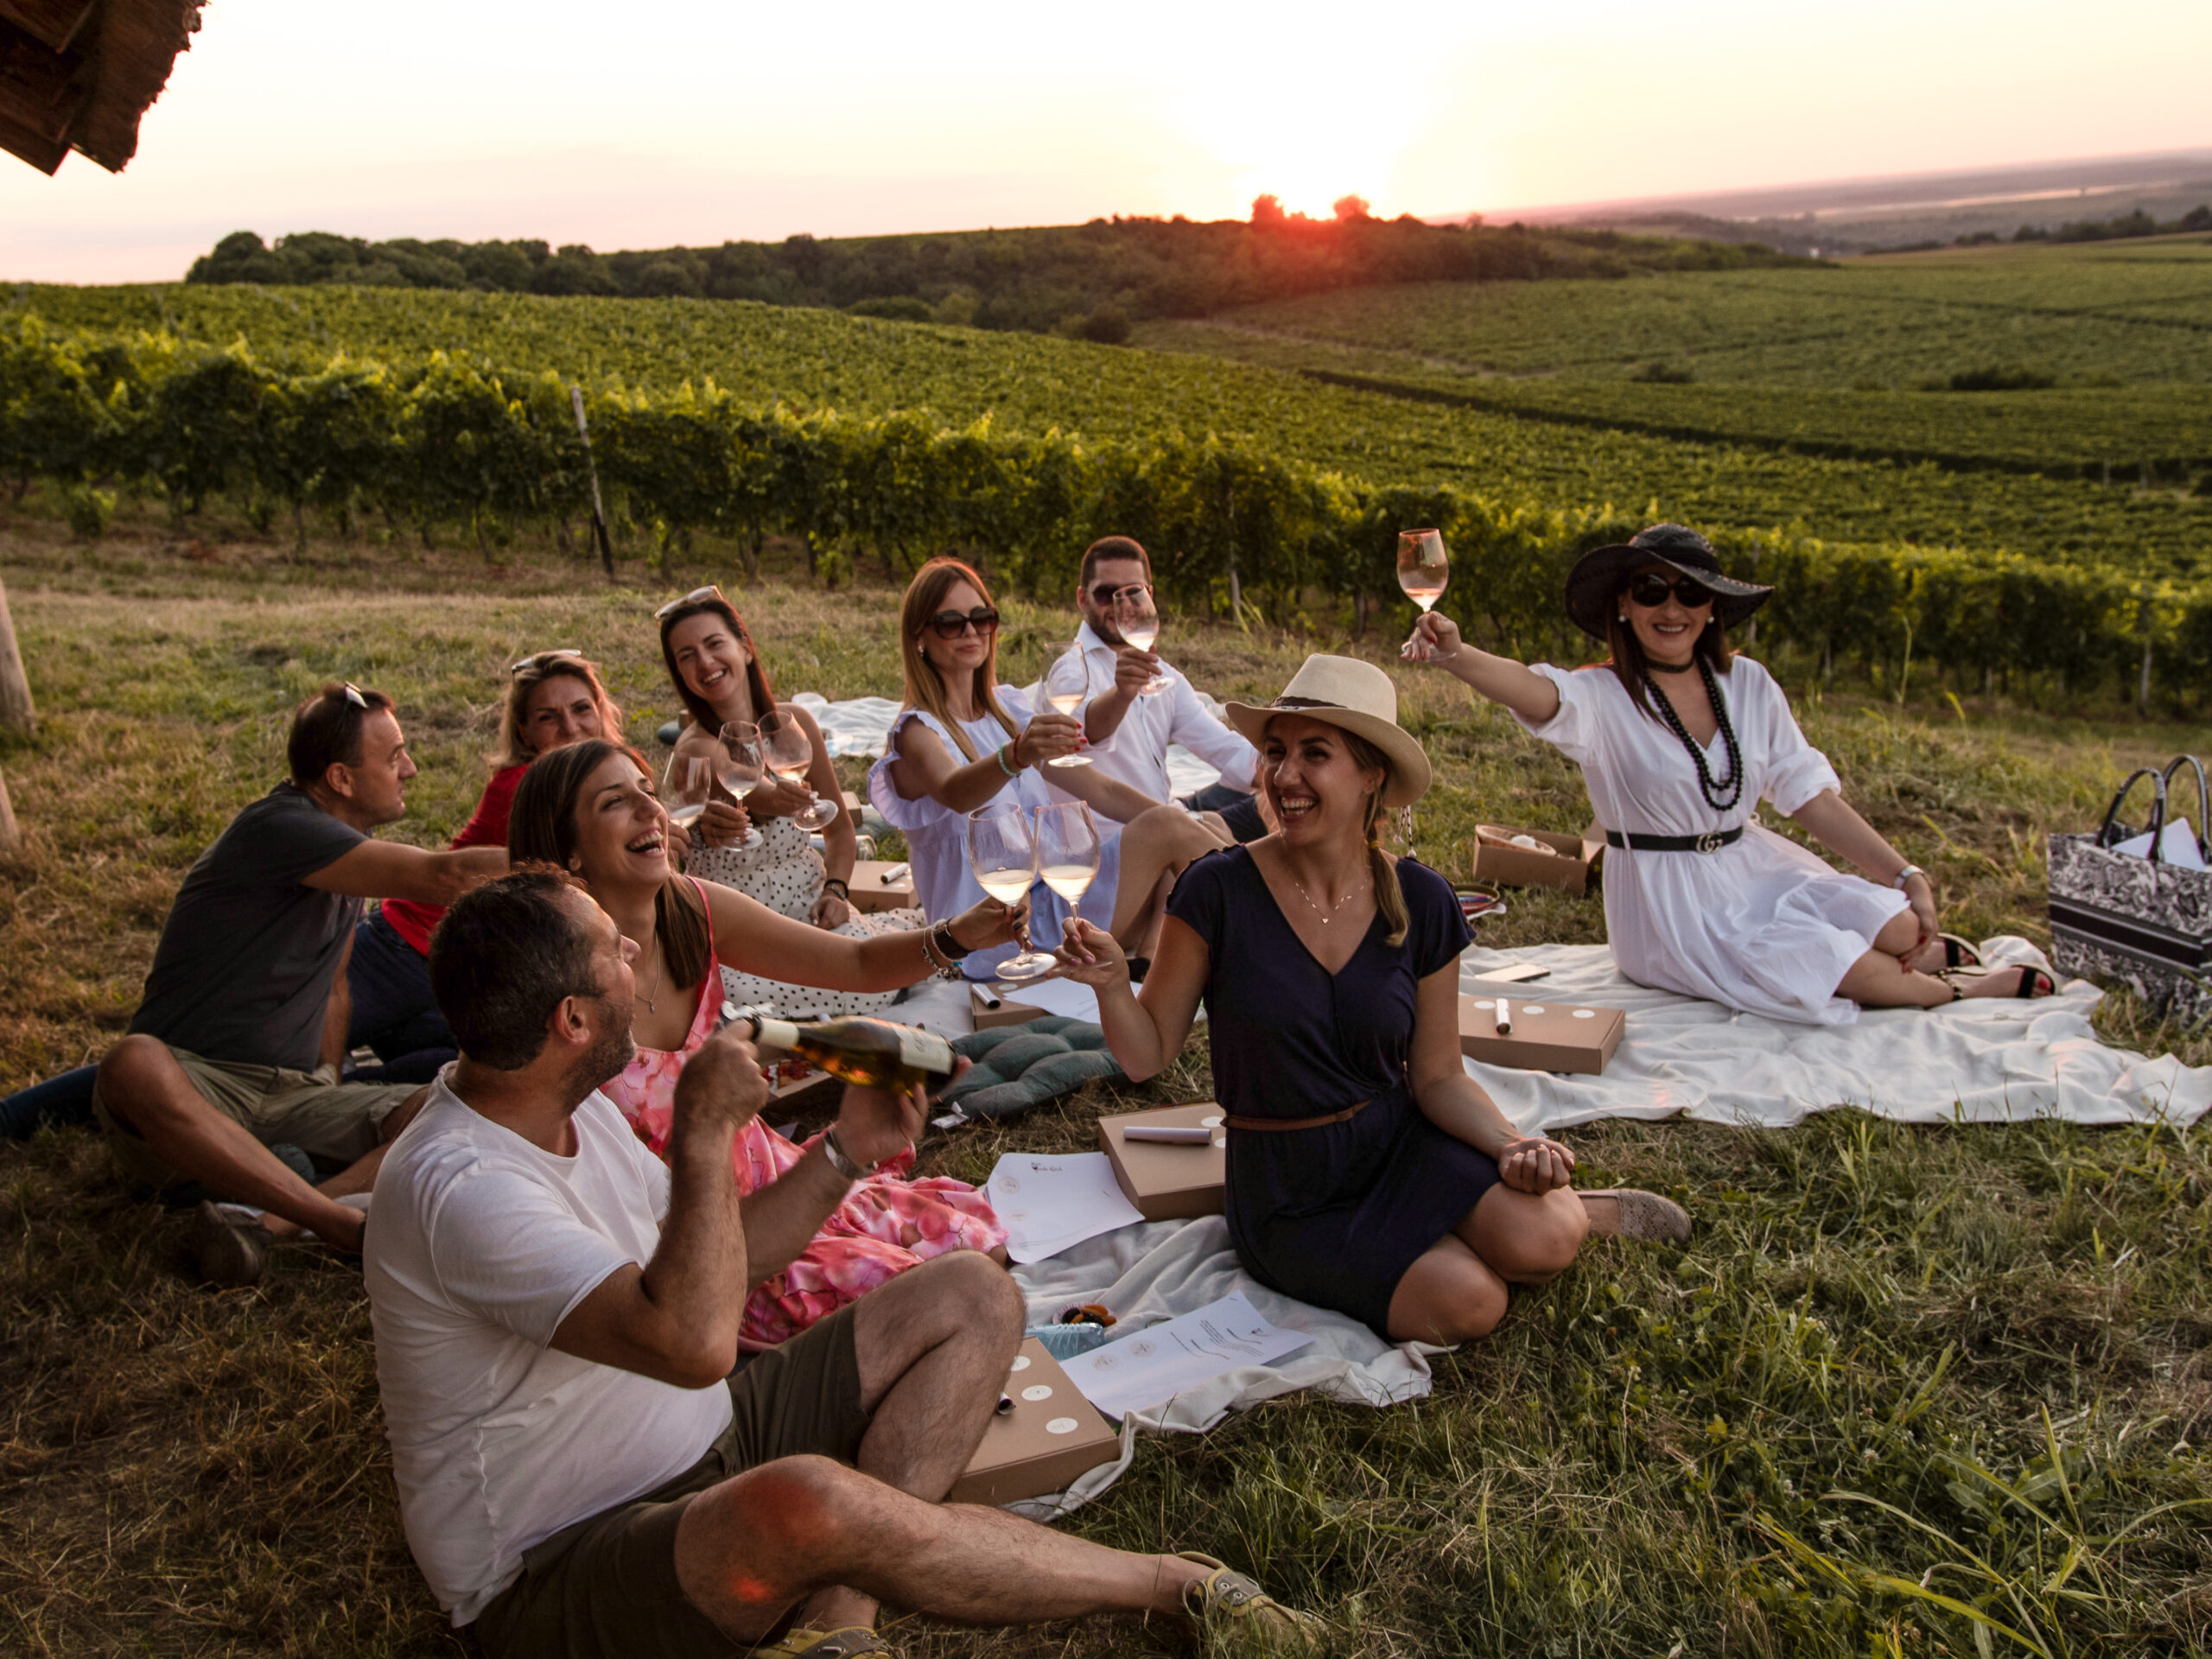 Vinski kutak piknik